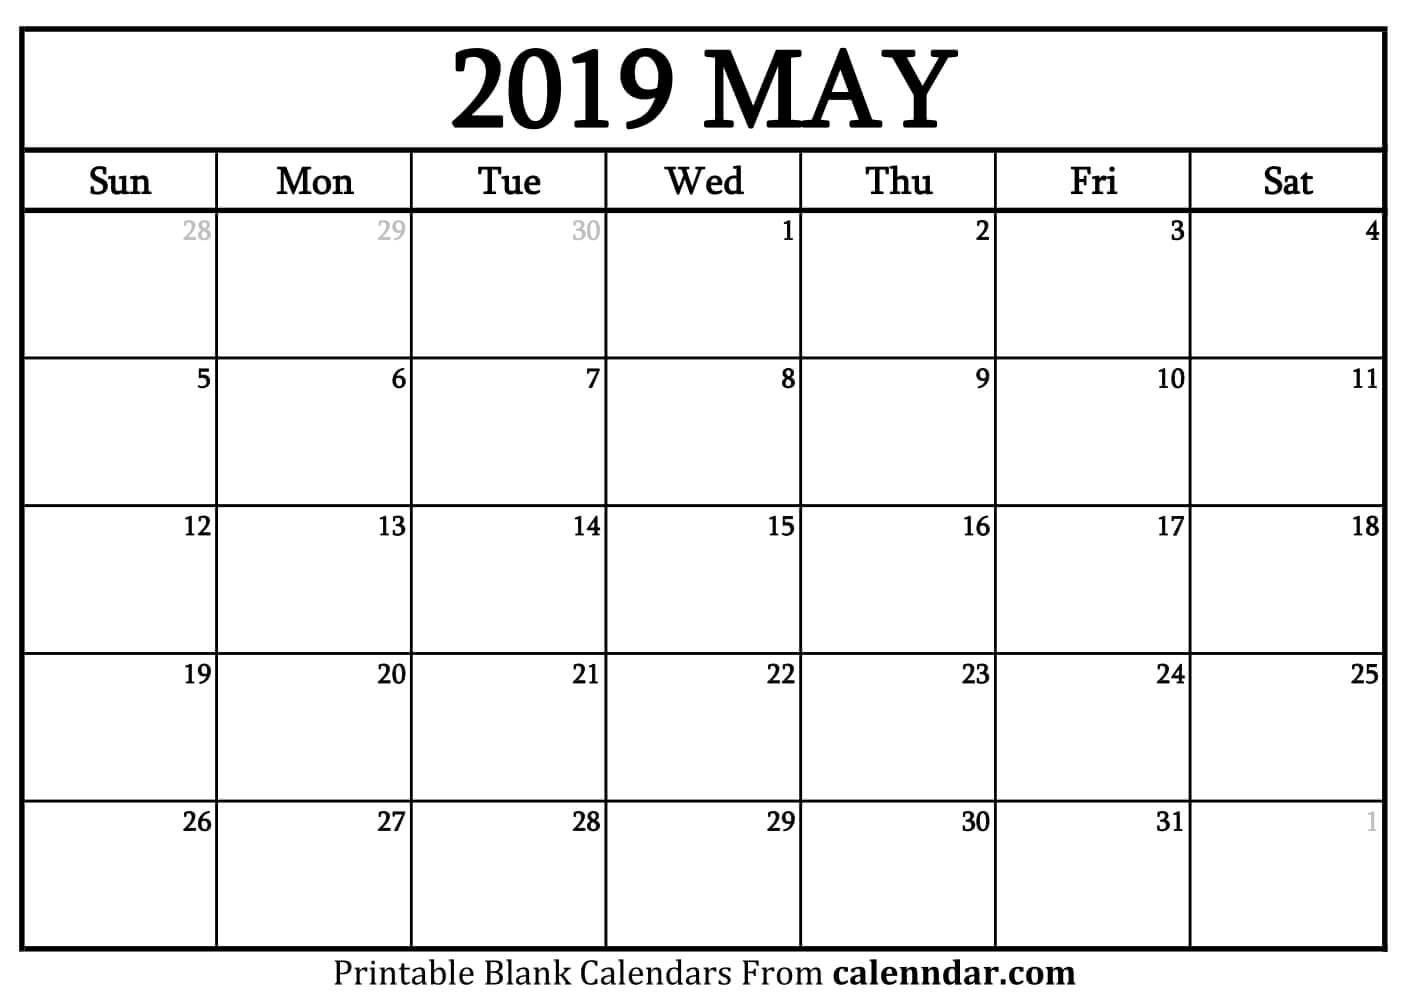 Blank May 2019 Calendar Templates – Calenndar Calendar Of 2019 May